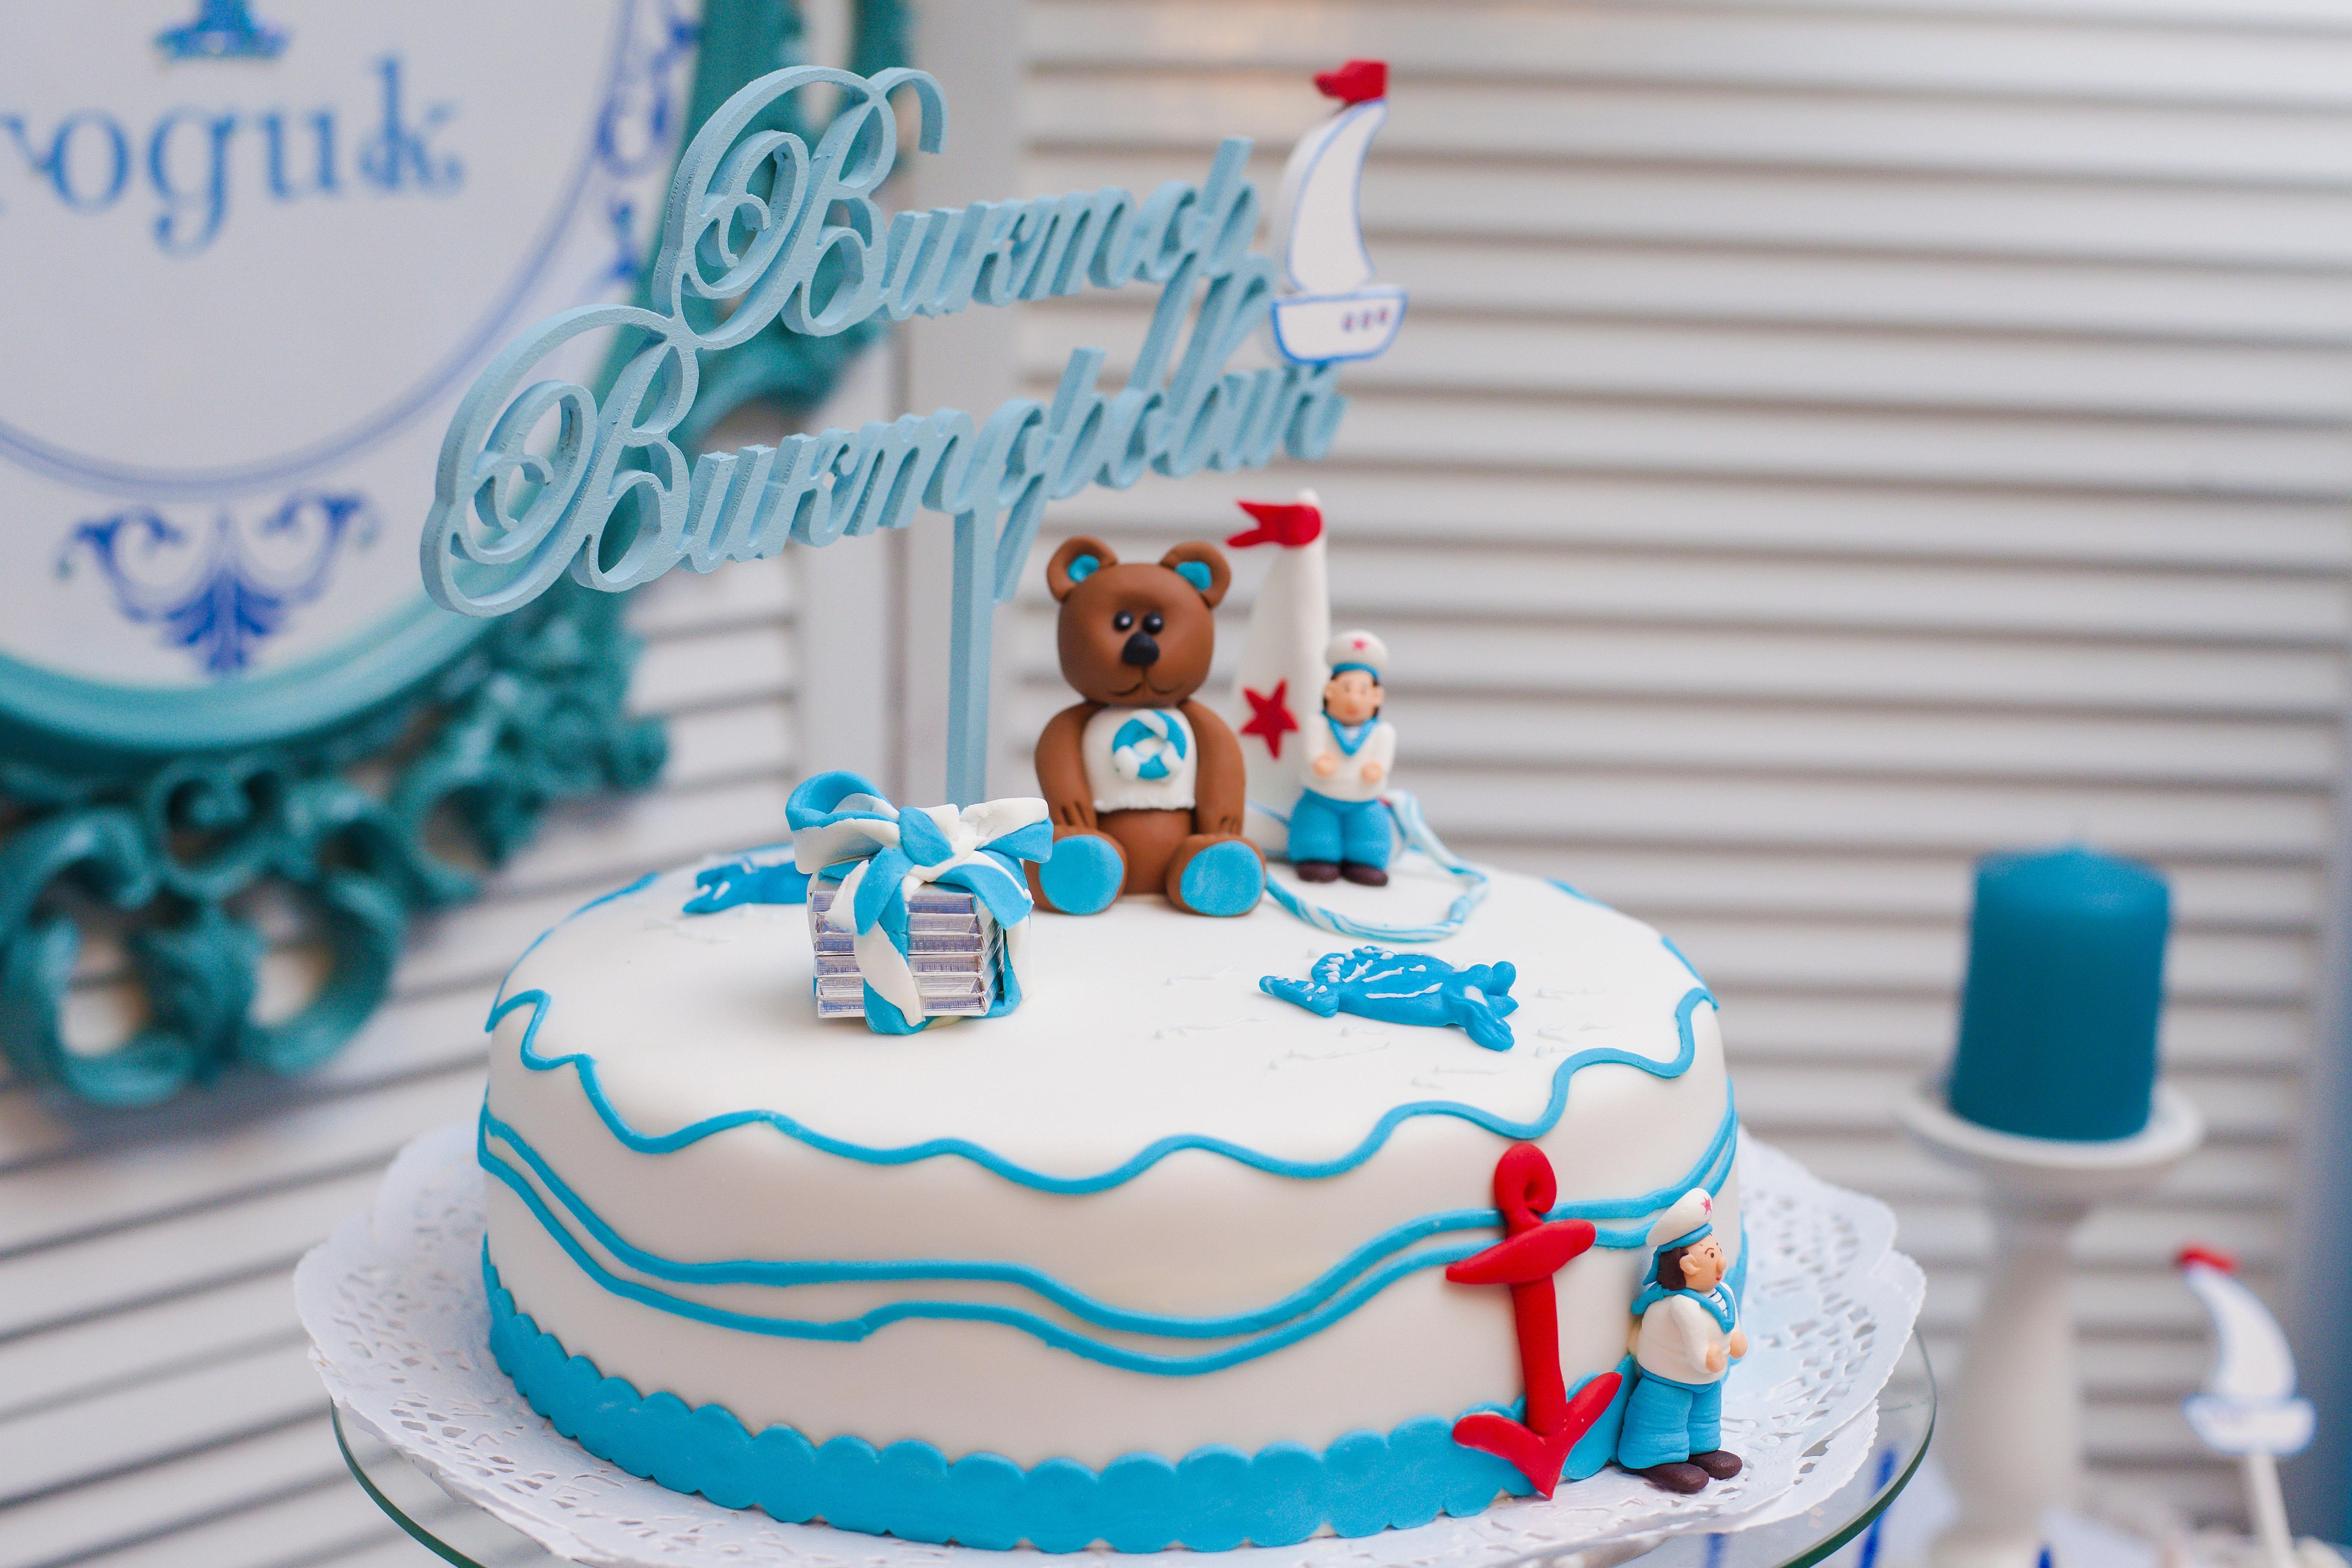 Free Images white food holiday blue cupcake baking dessert